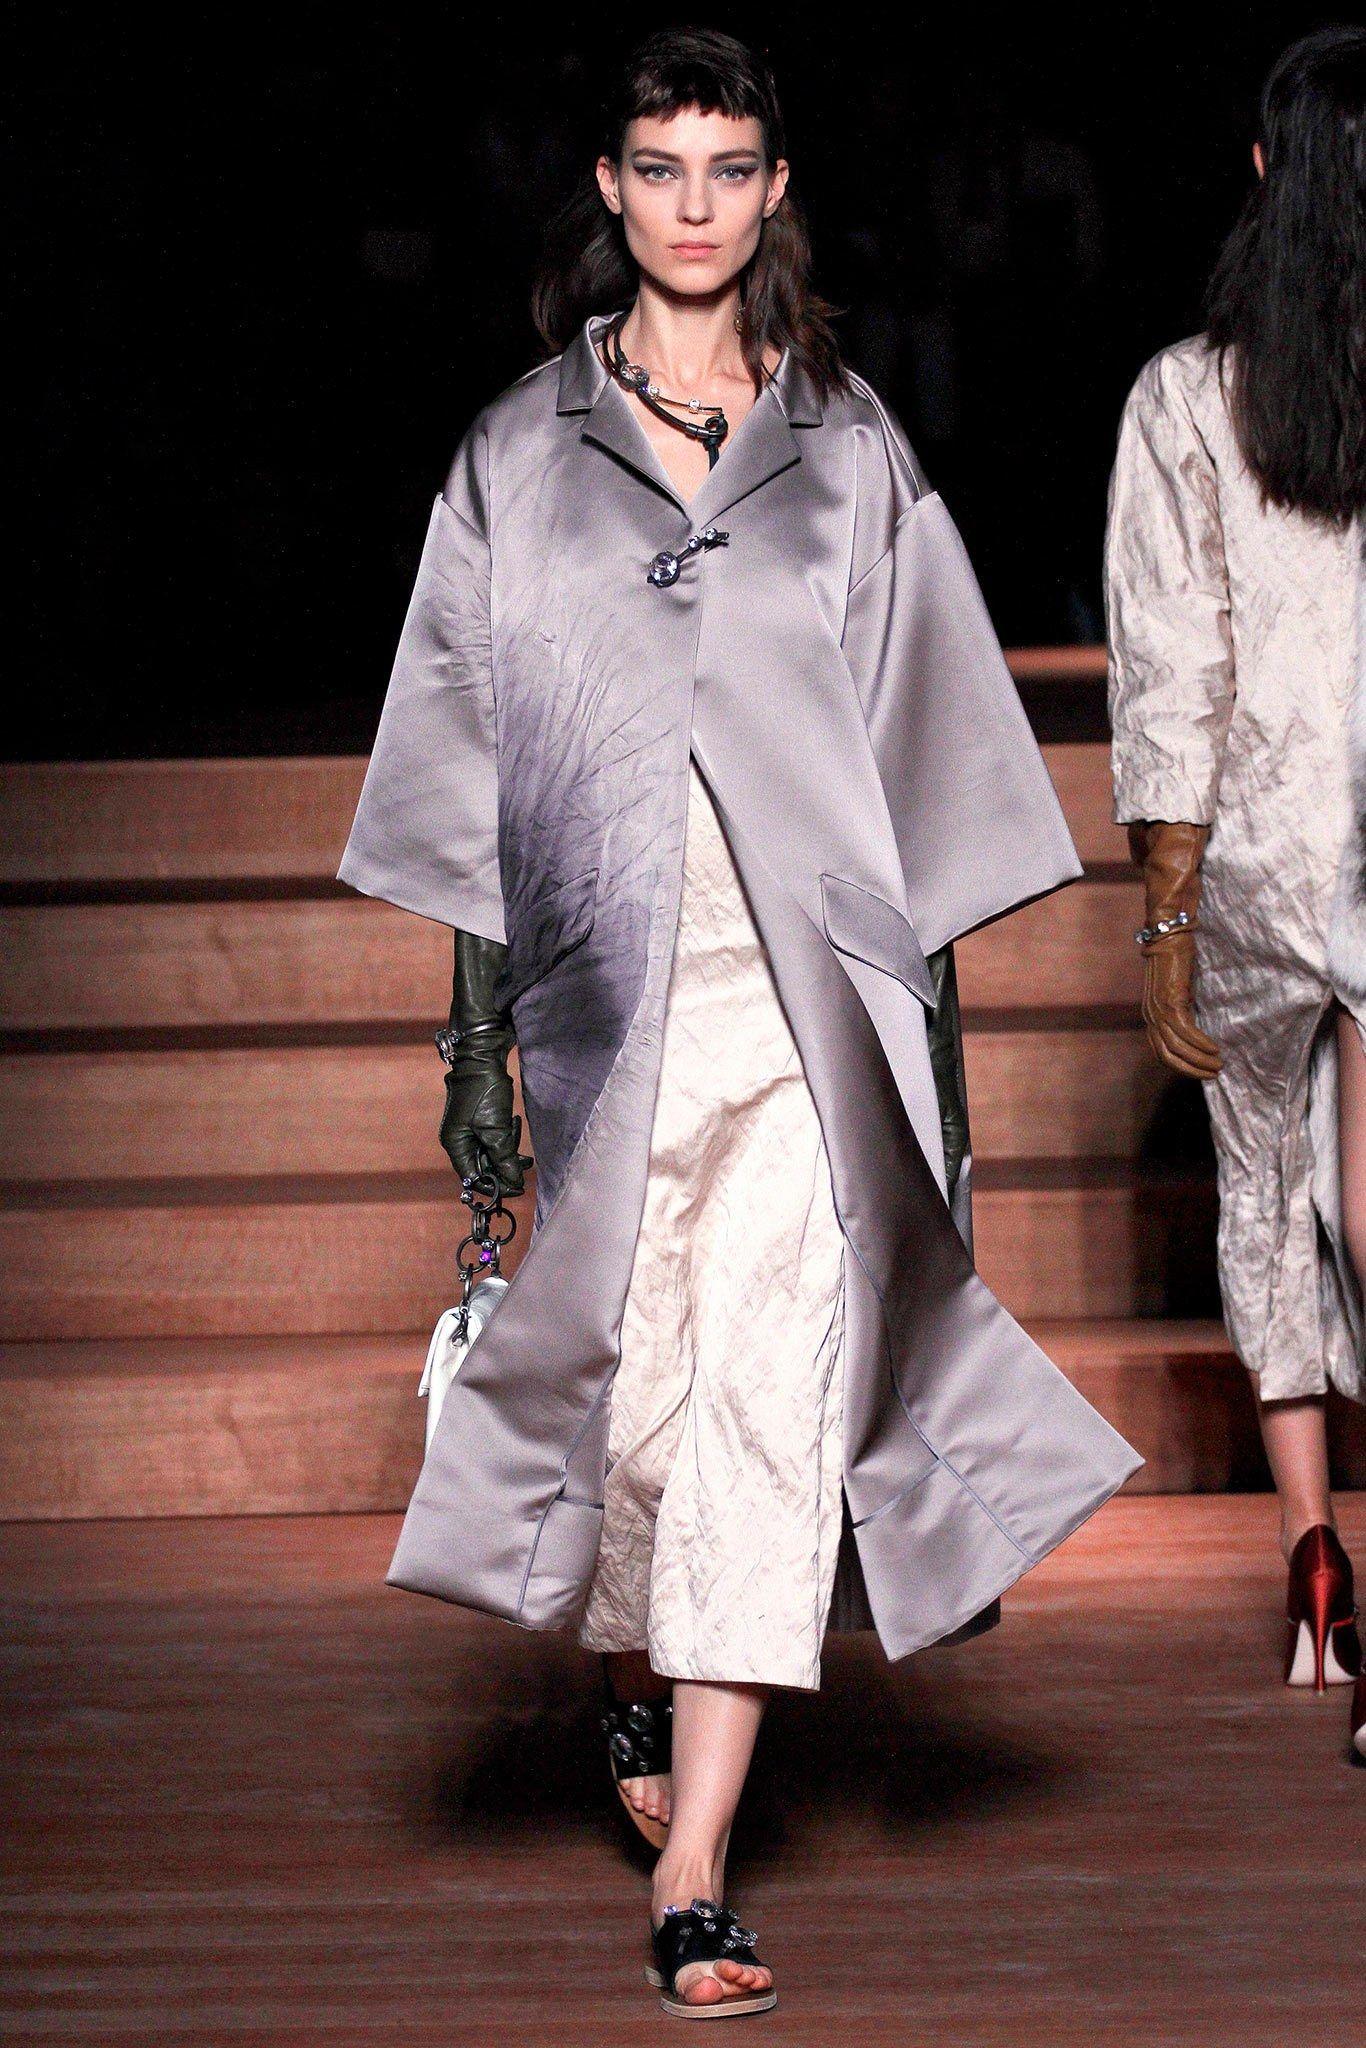 2d146371c07a Miu Miu Spring 2013 Ready-to-Wear Collection - Vogue